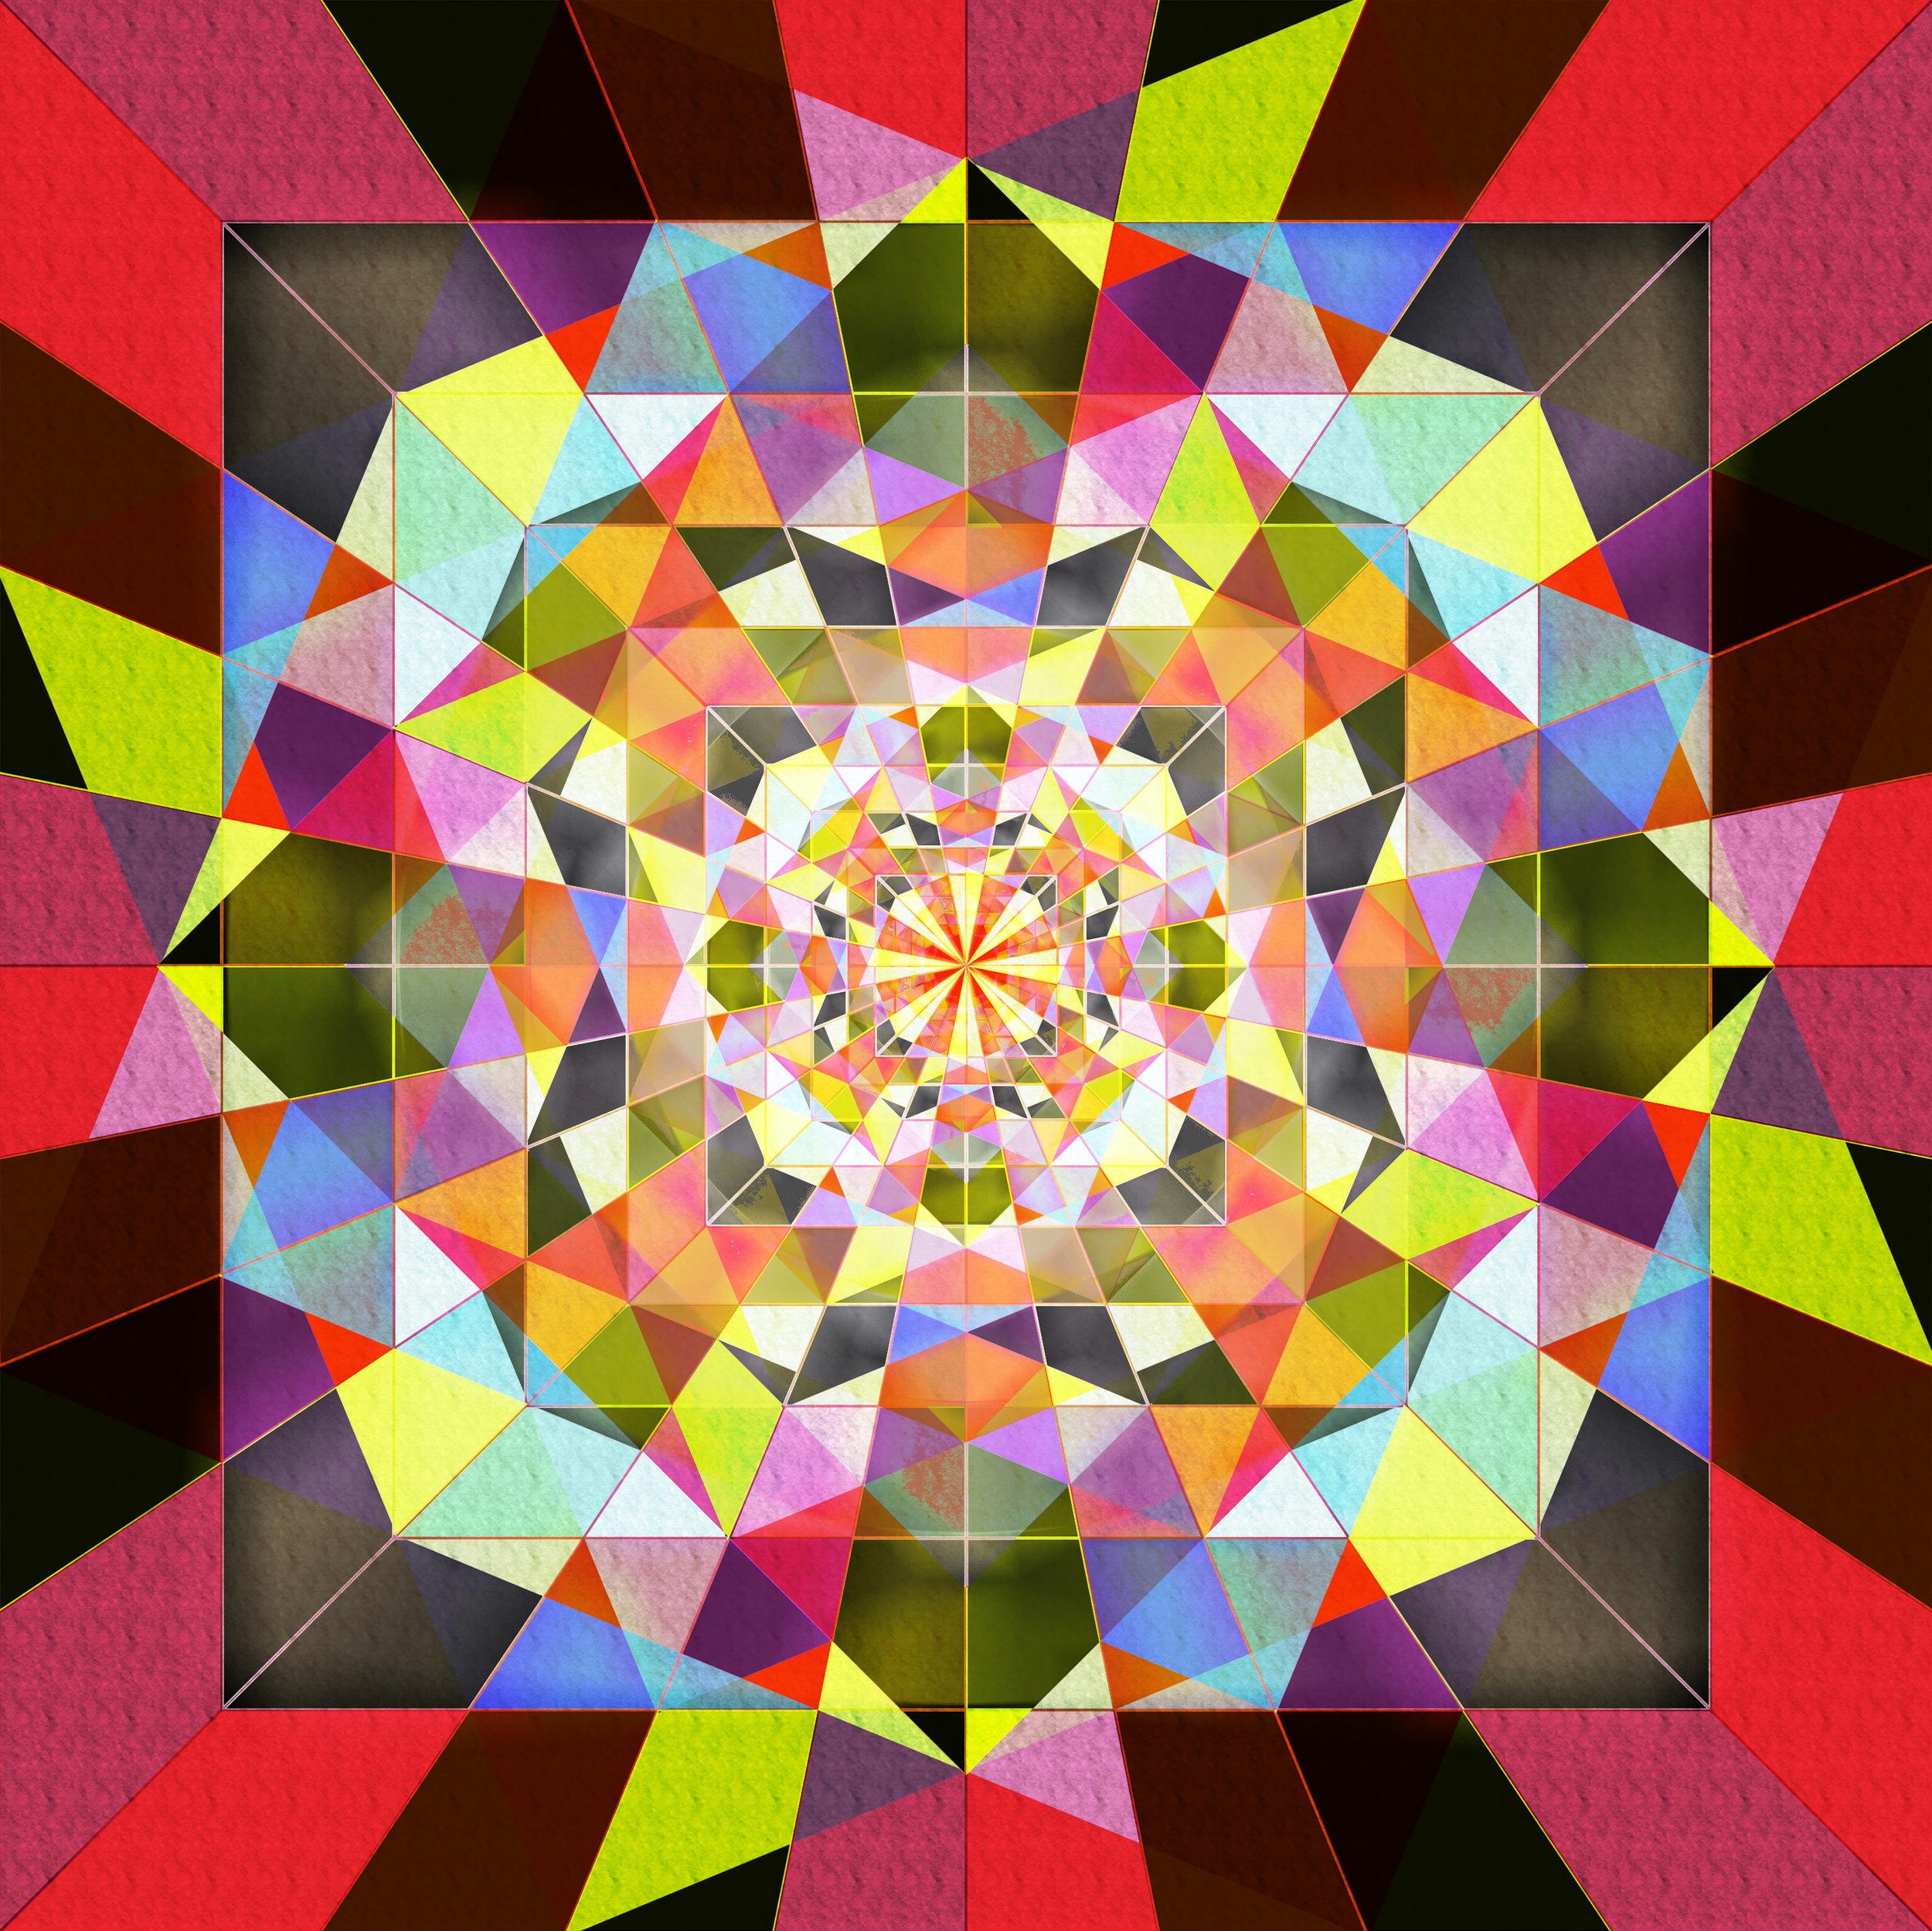 square_spiral2.jpg